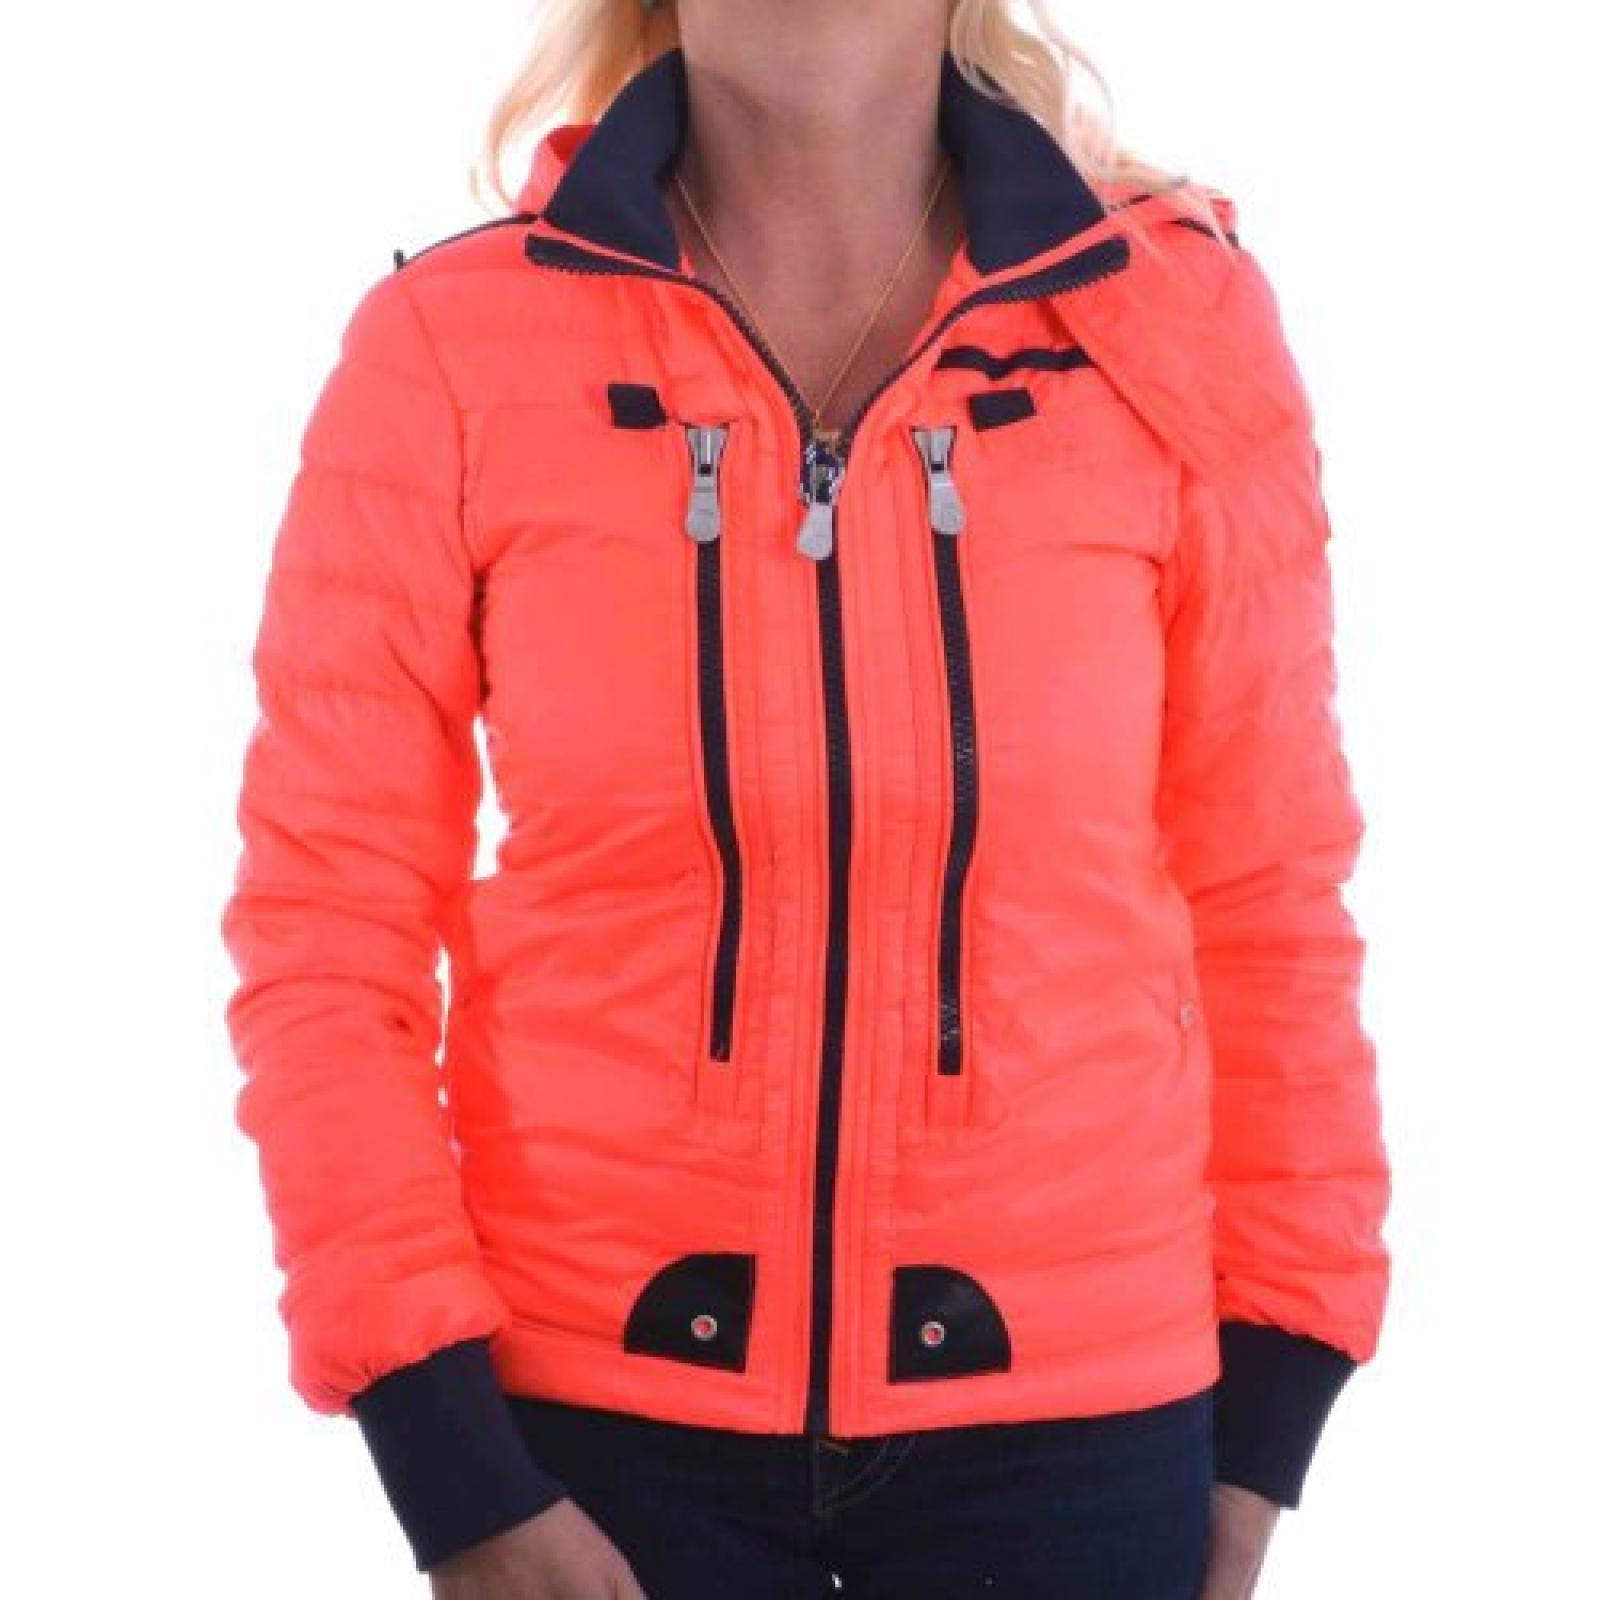 Gaastra Damenjacke Alba Gr. XL UVP 269,95 Euro 36129041 Orange 487 Damen Jacke